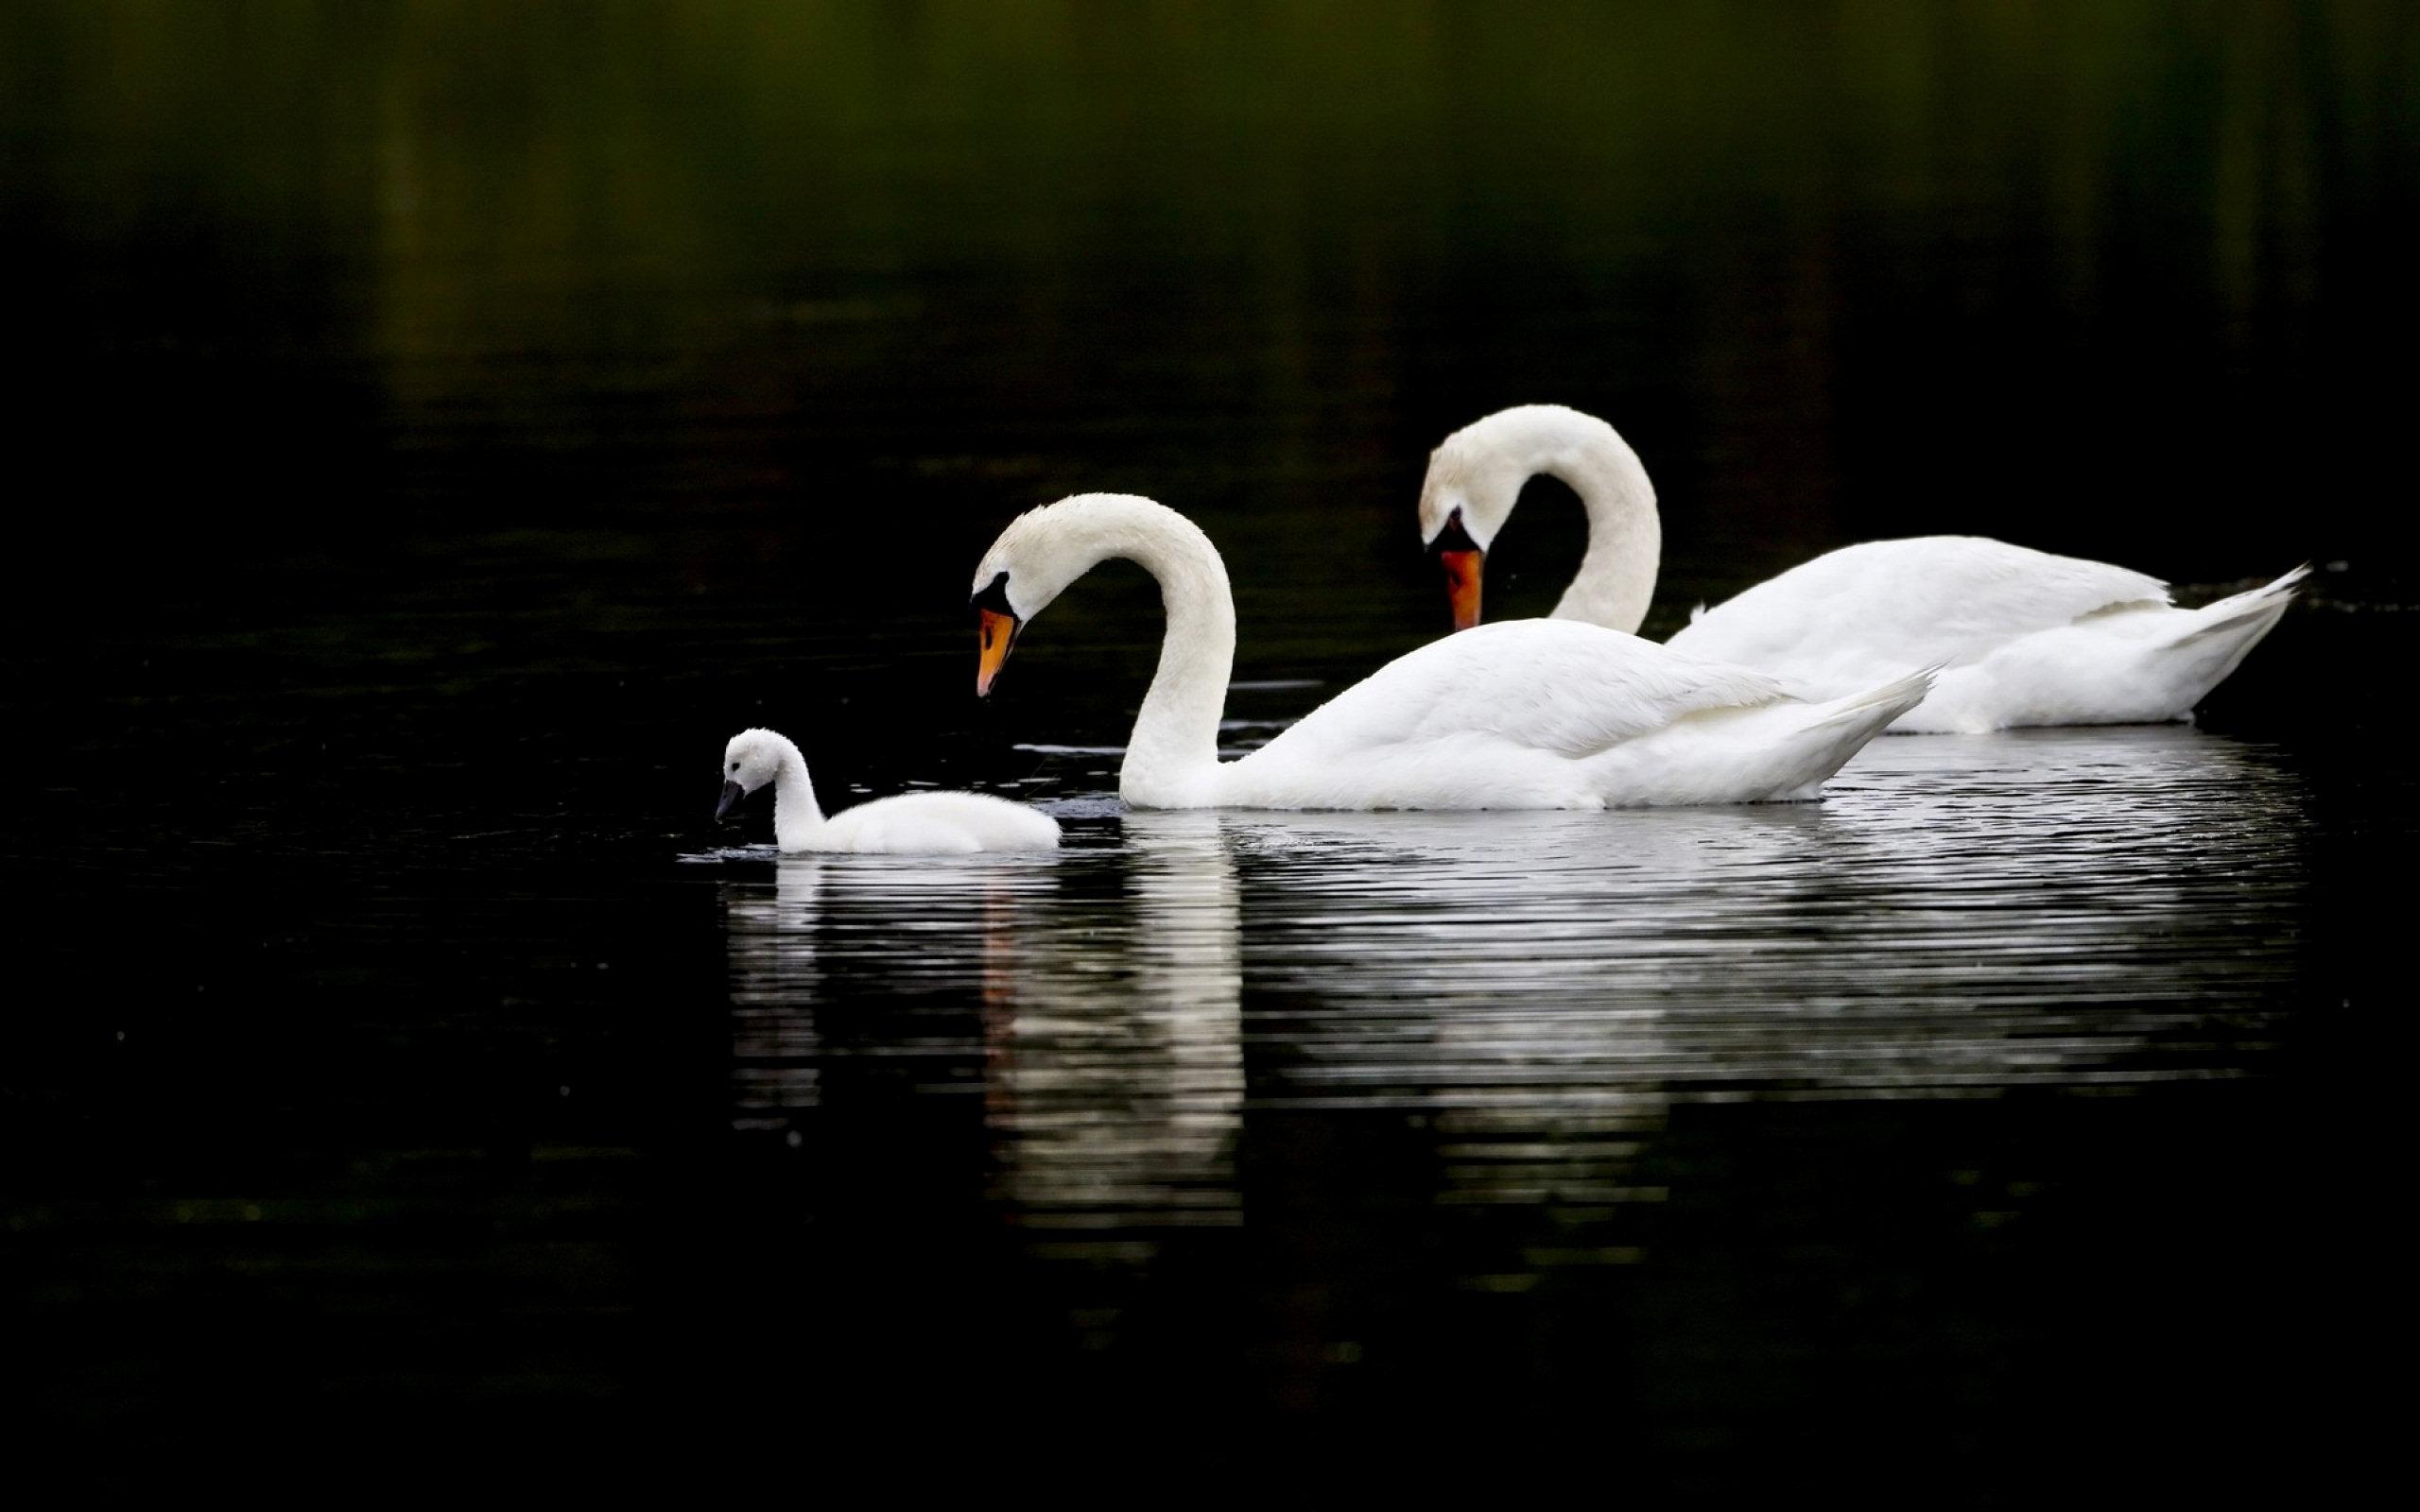 HD Swan Wallpaper Full HD Pictures 2560x1600